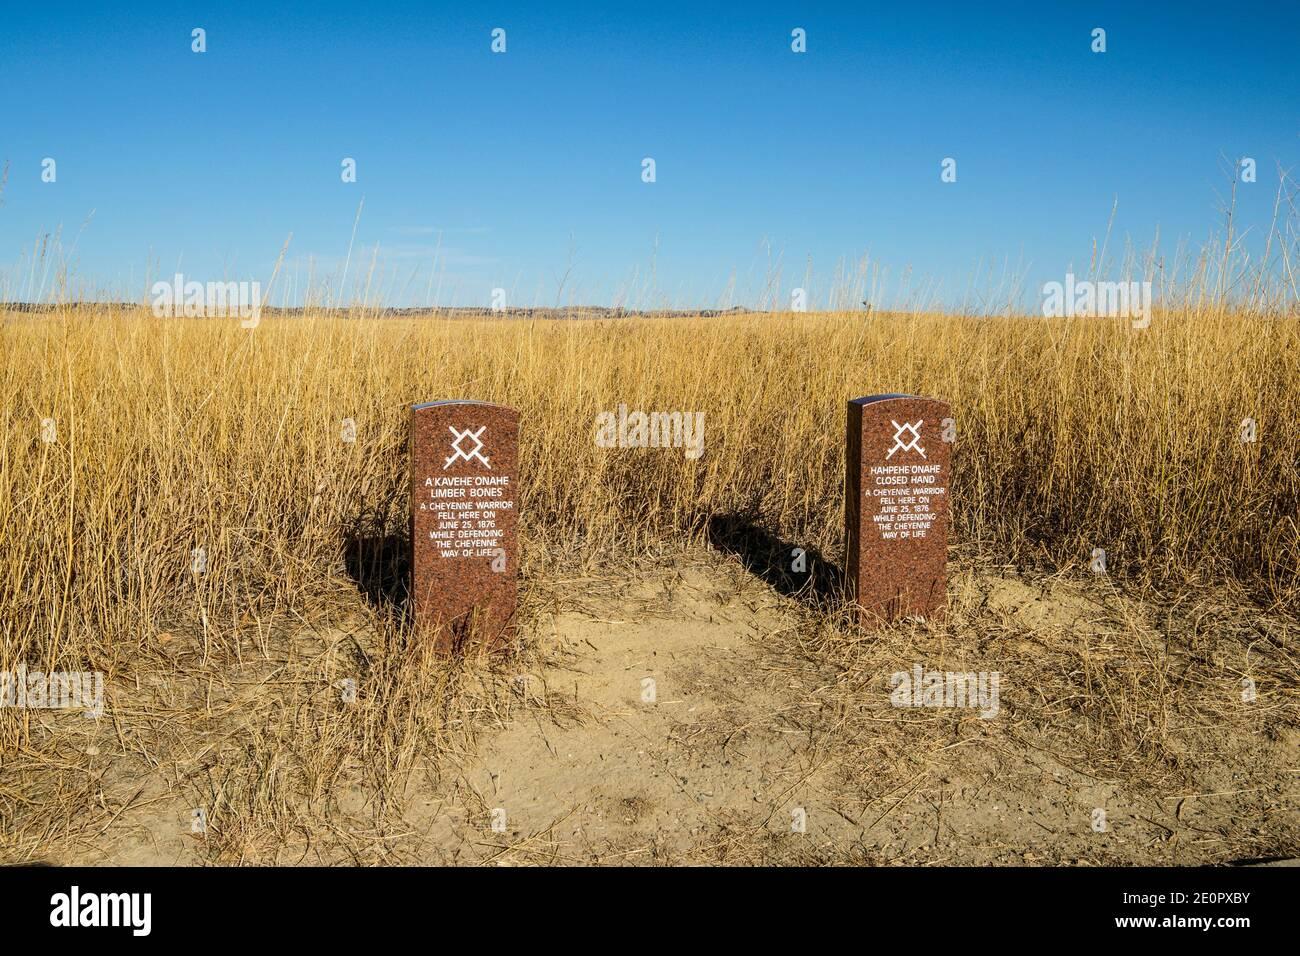 Pietre di Guerriero Cheyenne. Little Bighorn Battlefield National Monument. Crow Agency, Montana, U.S.A., Nord America. Foto Stock